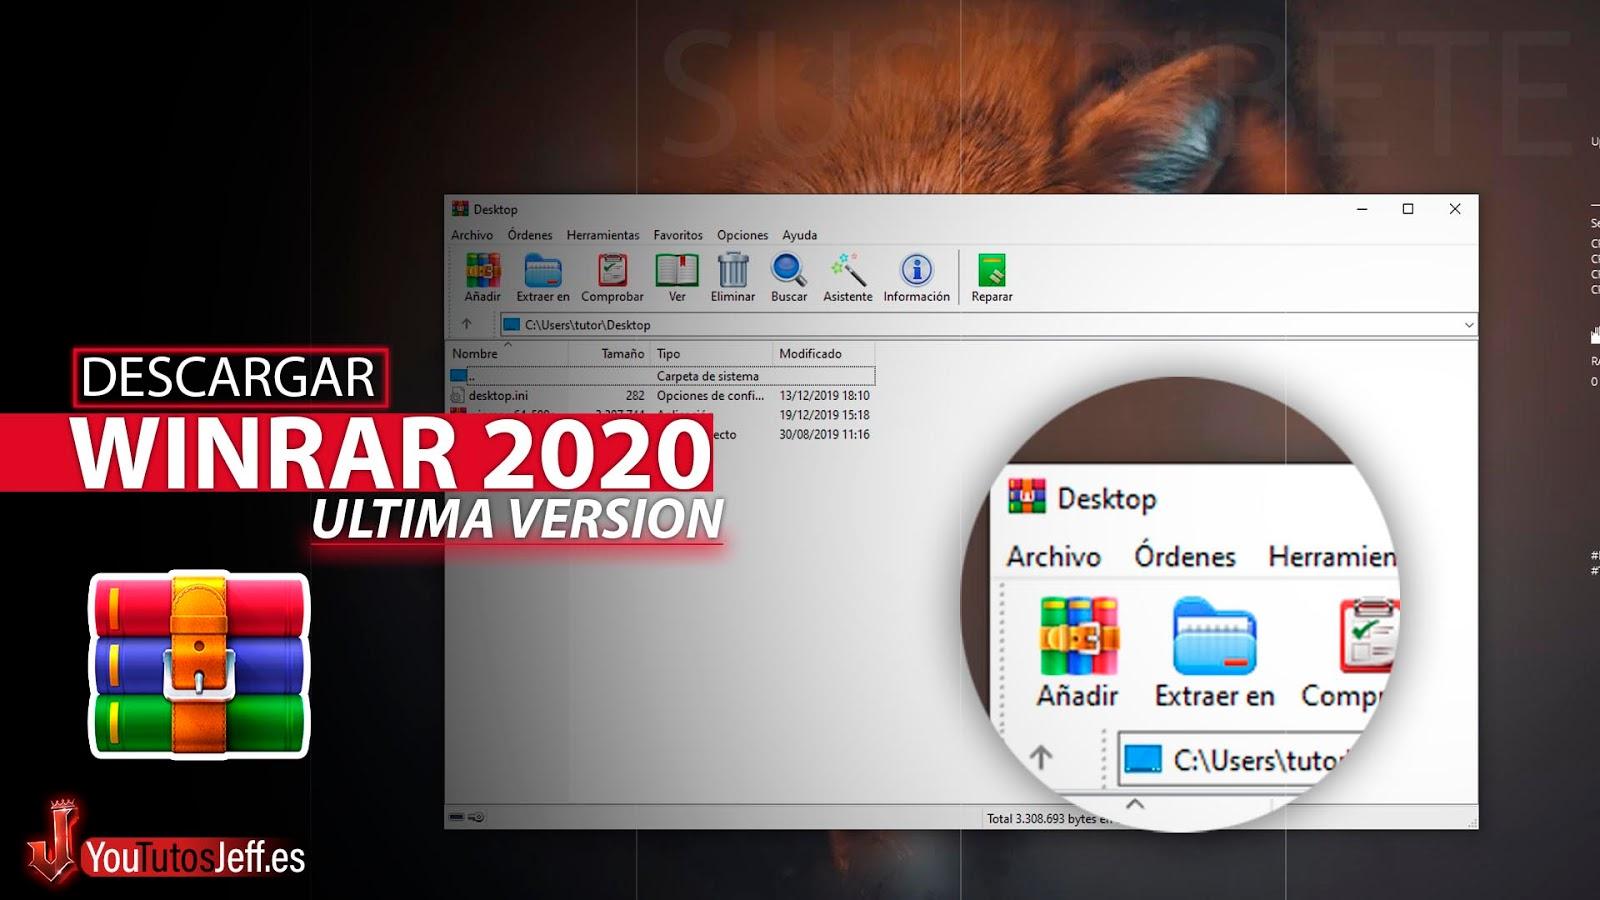 Como Descargar Winrar Ultima Versión 2020 Gratis Español